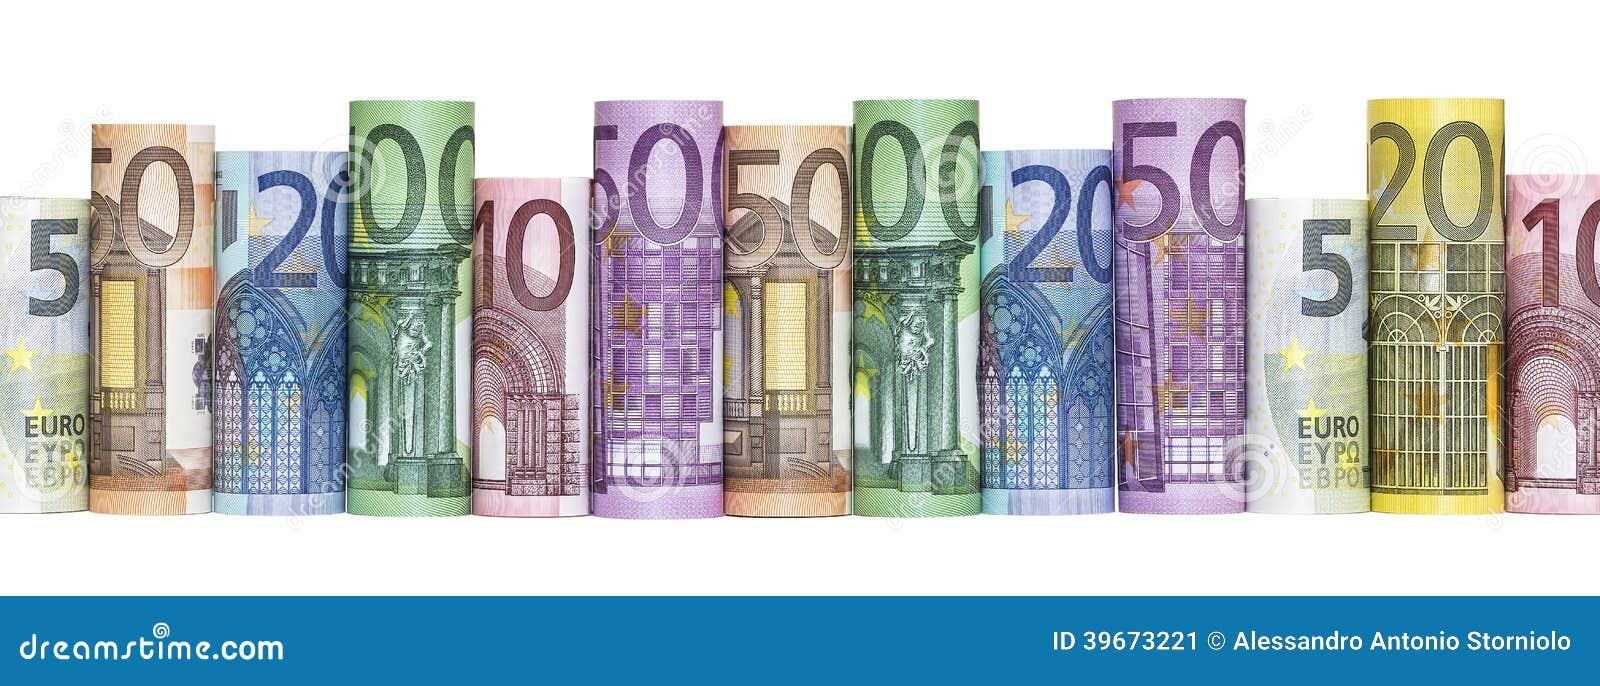 Eurogeld-Banknoten